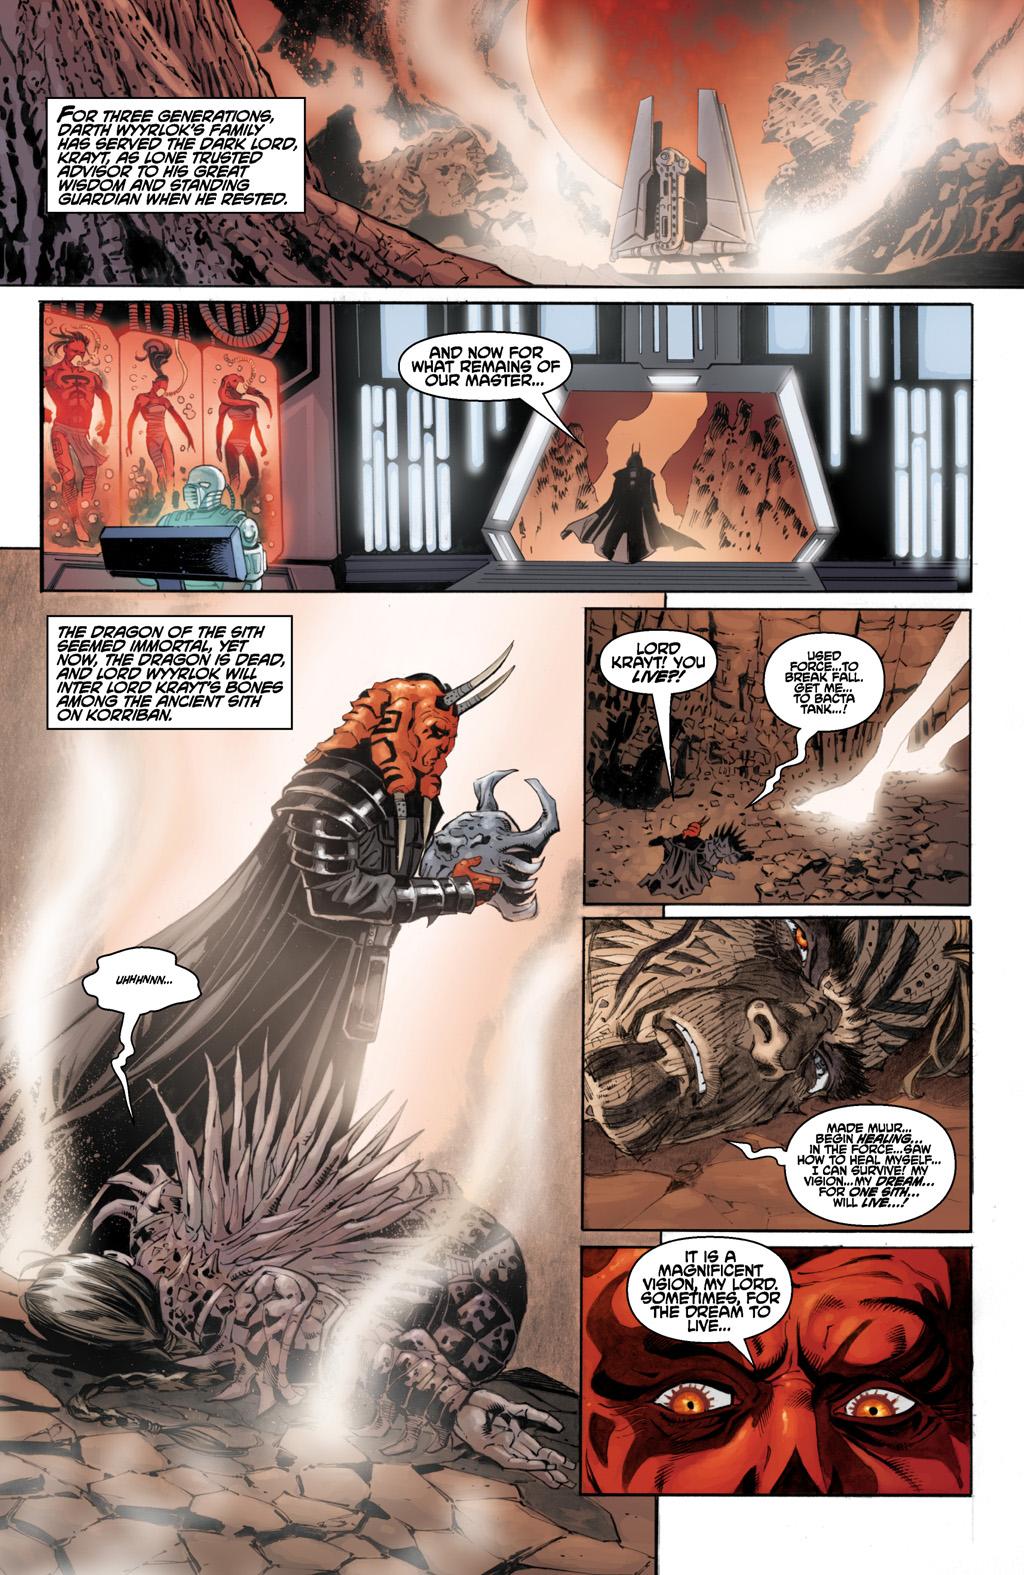 SS - Cade Skywalker (ArkhamAsylum3) vs. Darth Malgus (Praxis) Krayt_24